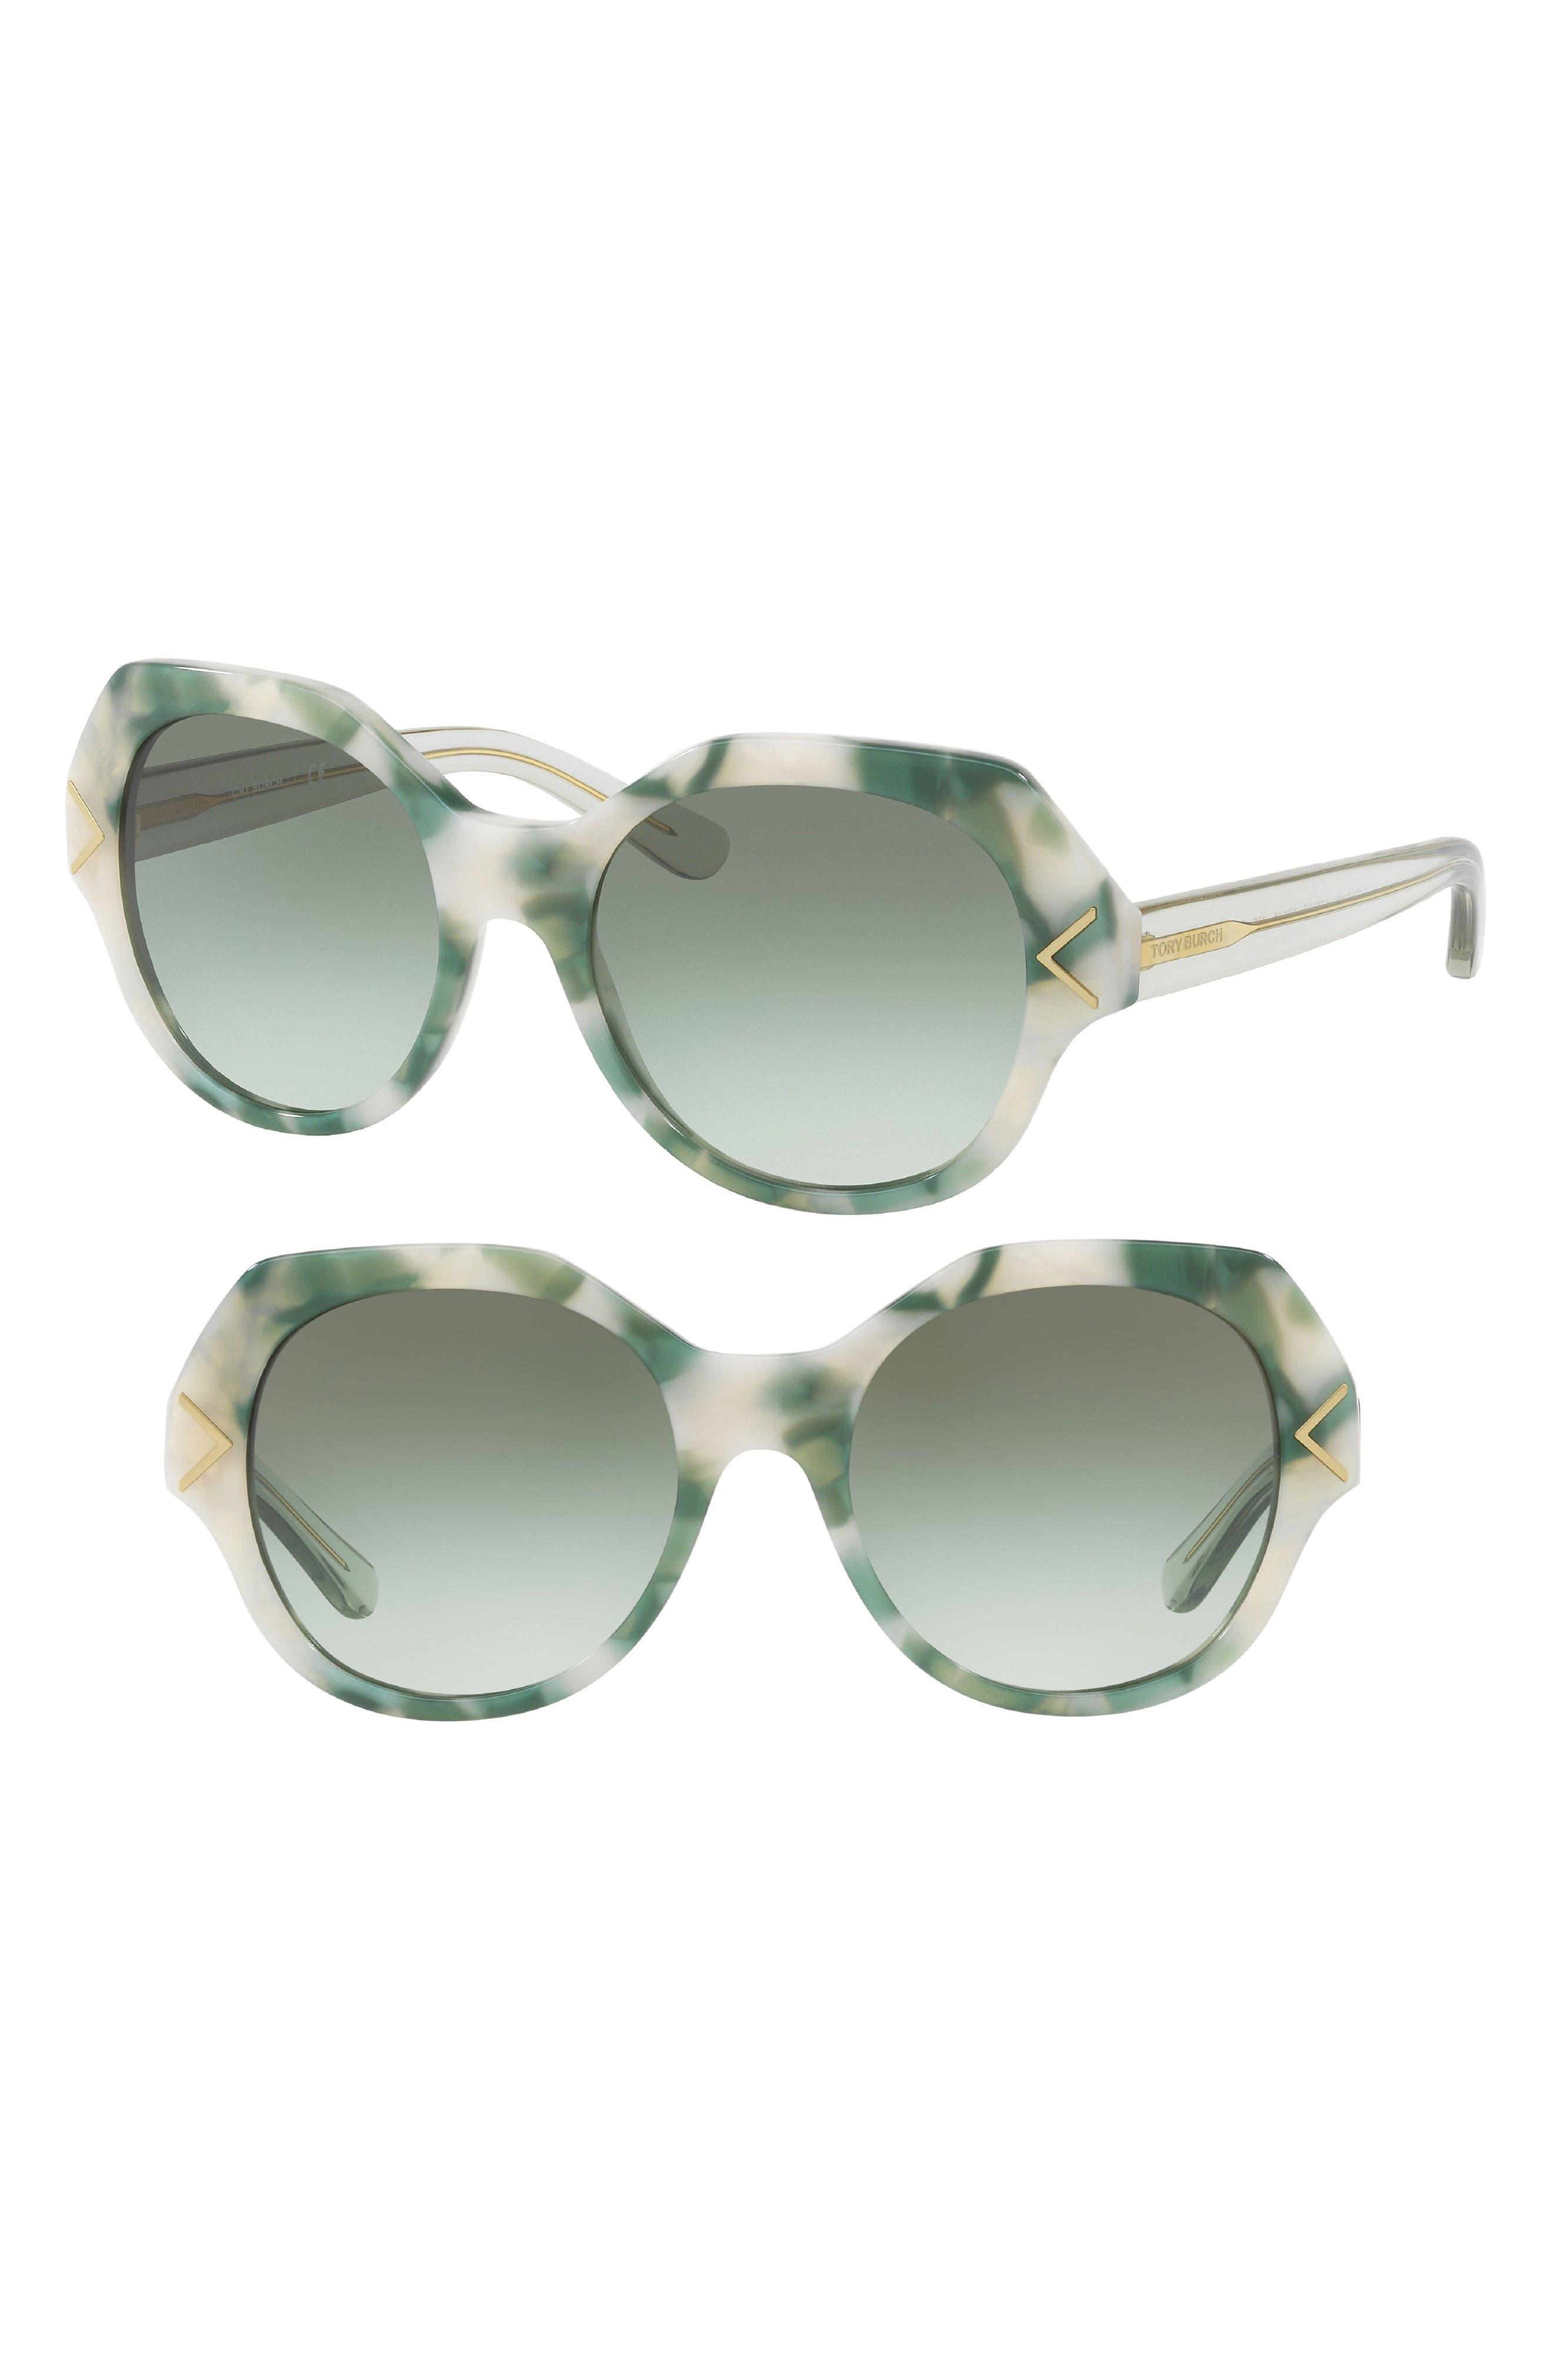 53mm Gradient Geometric Sunglasses,                             Main thumbnail 1, color,                             Dark Green Marble